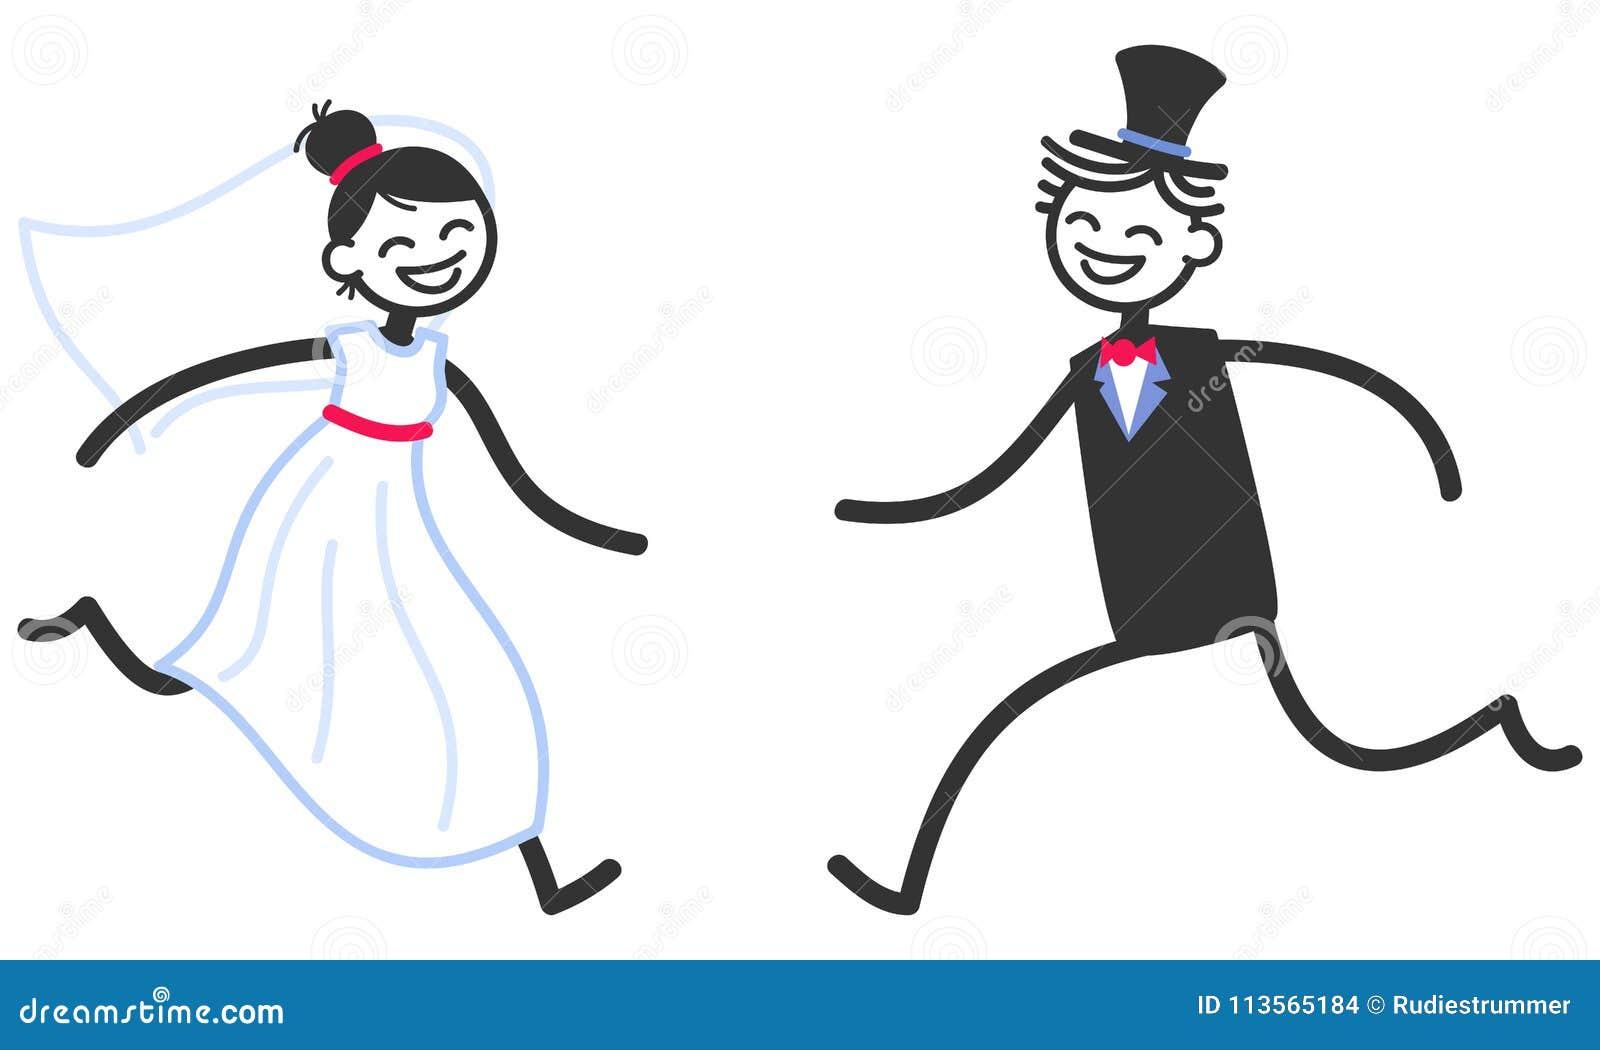 vector wedding illustration of happy stick figures bridal couple